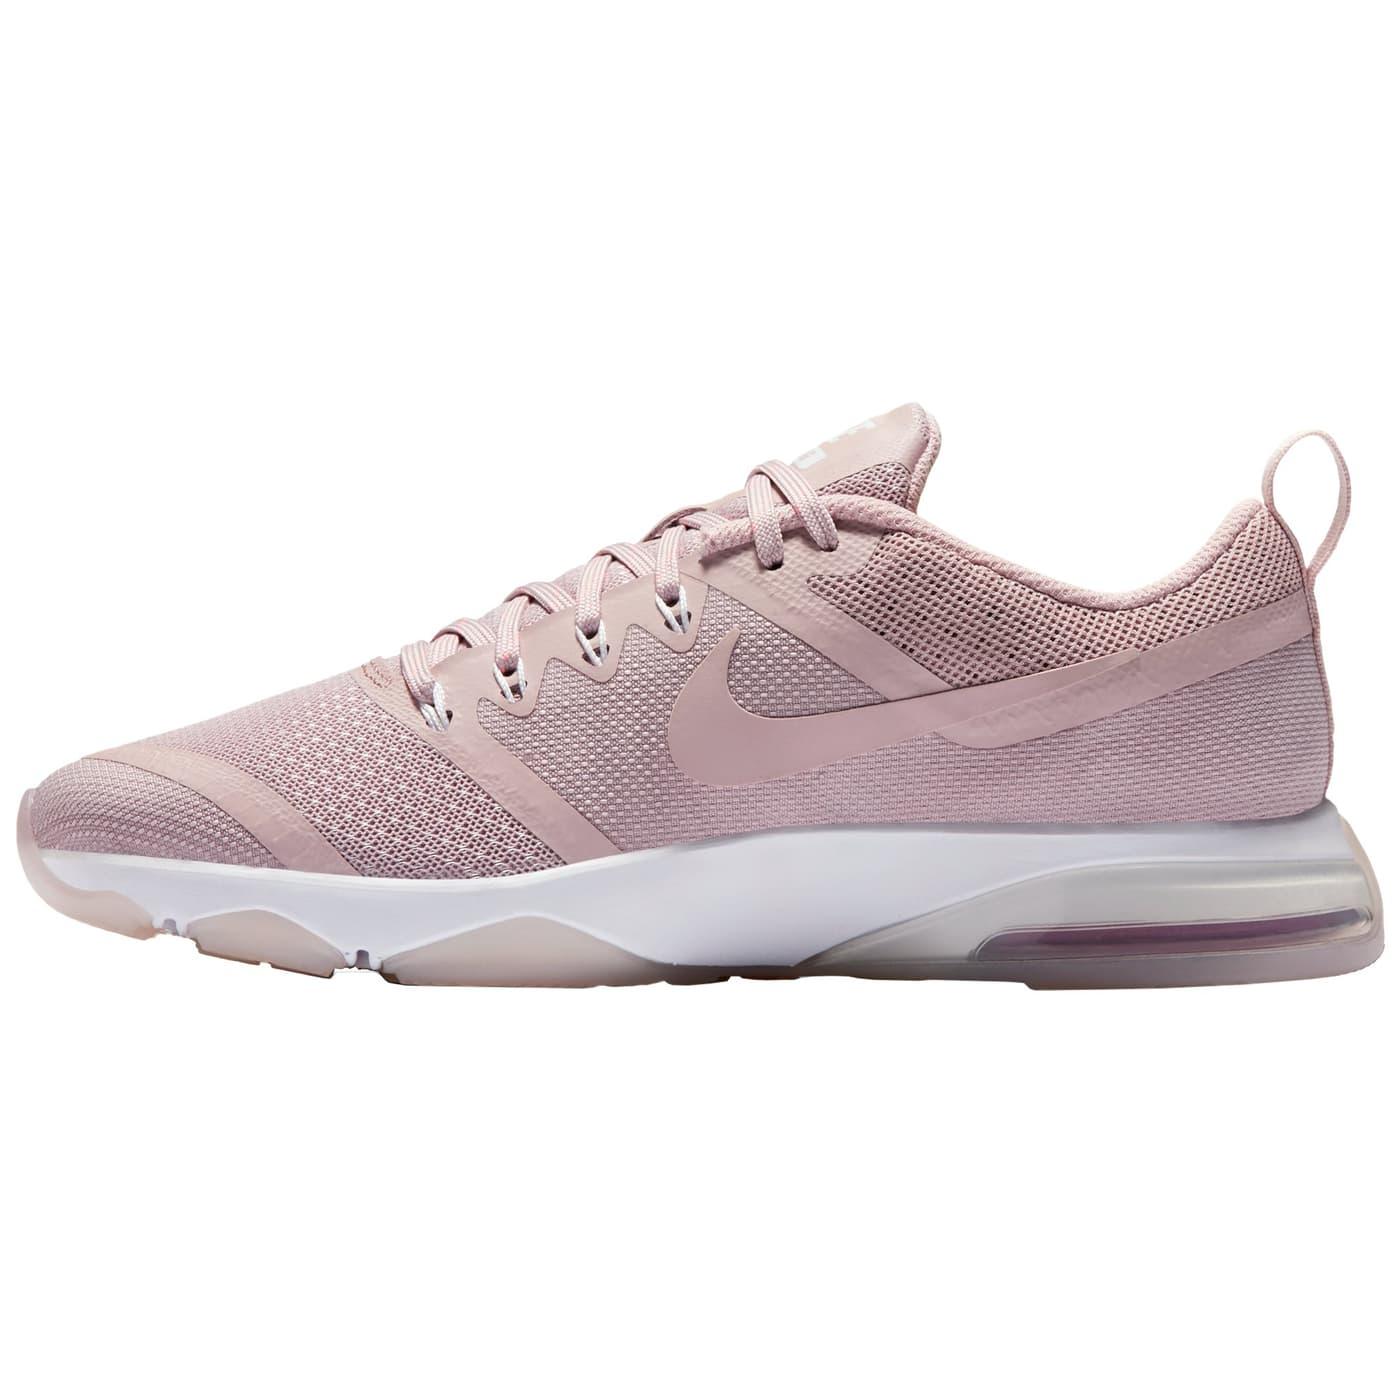 De Pour Nike Fitness Chaussures Femme vNOm8nw0